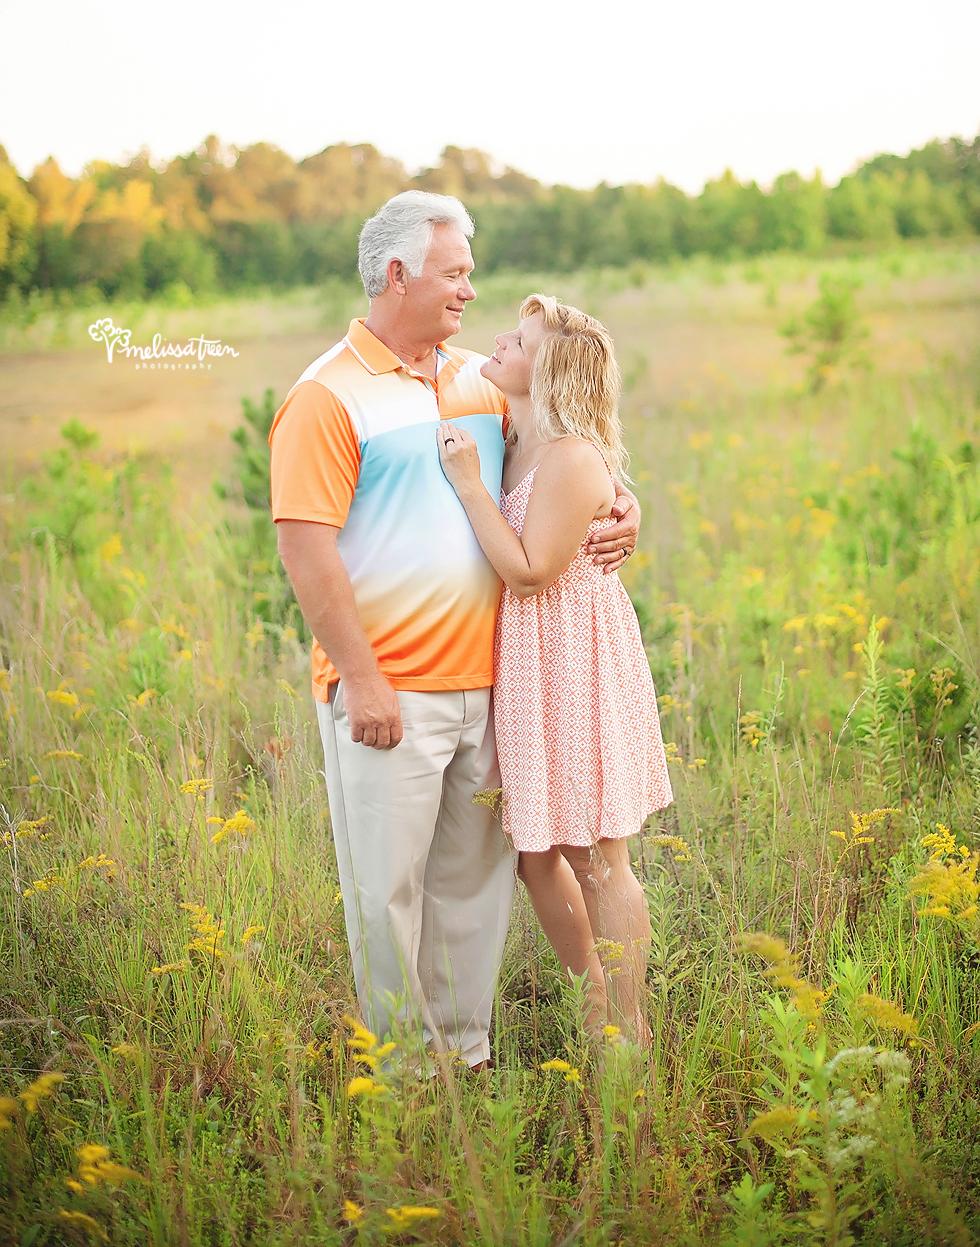 family-photo-greensboro-nc sunset phtoography MT7_6956.jpg